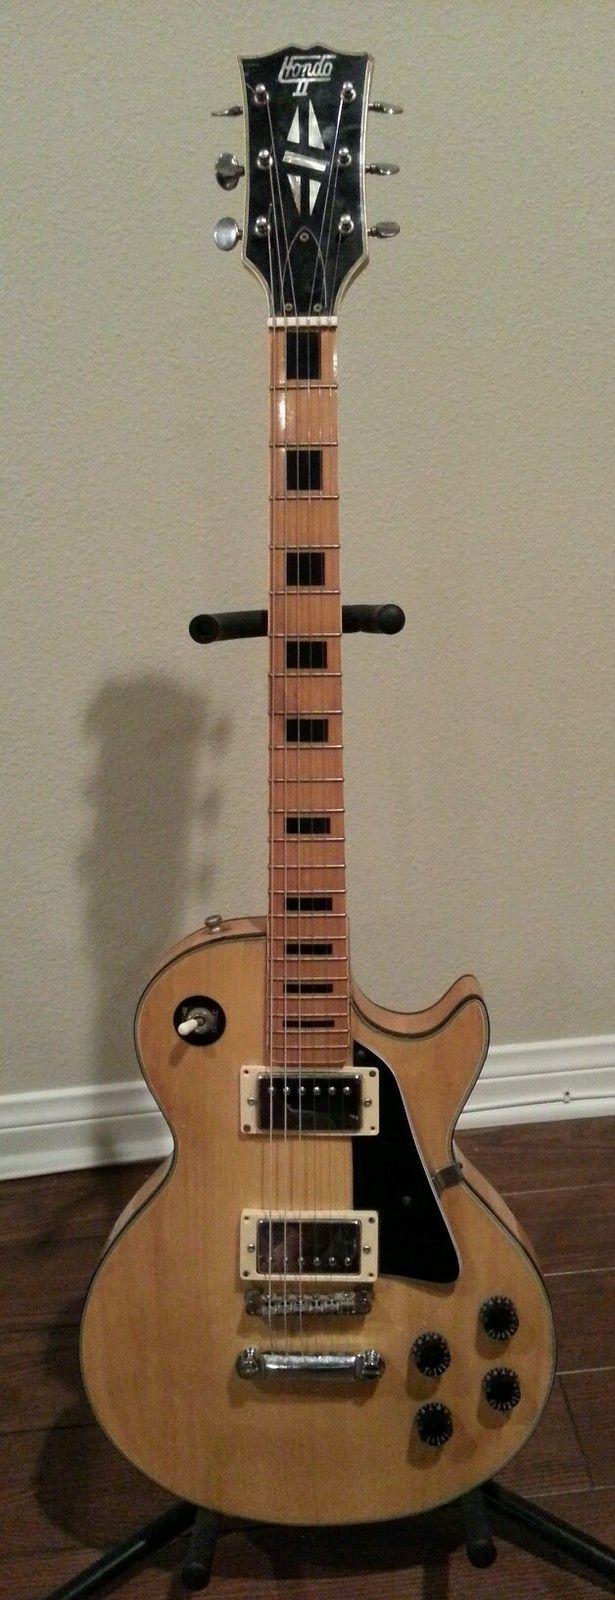 17+ best images about Hondo Guitars on Pinterest | Vintage